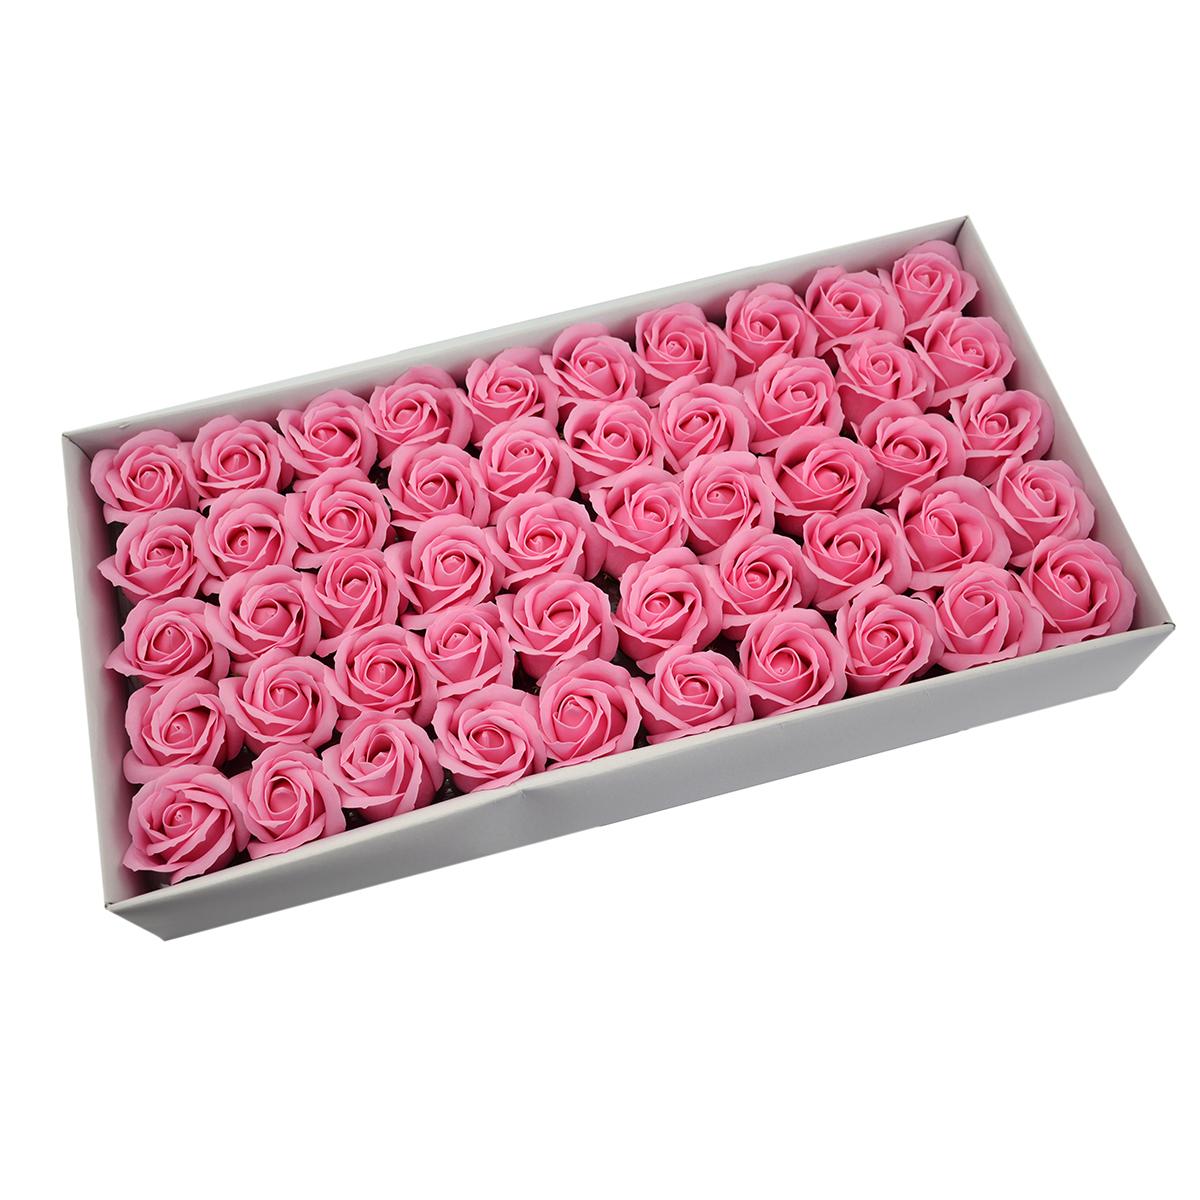 Juego de 50 rosas de jabón aromáticas, toque real, rosa